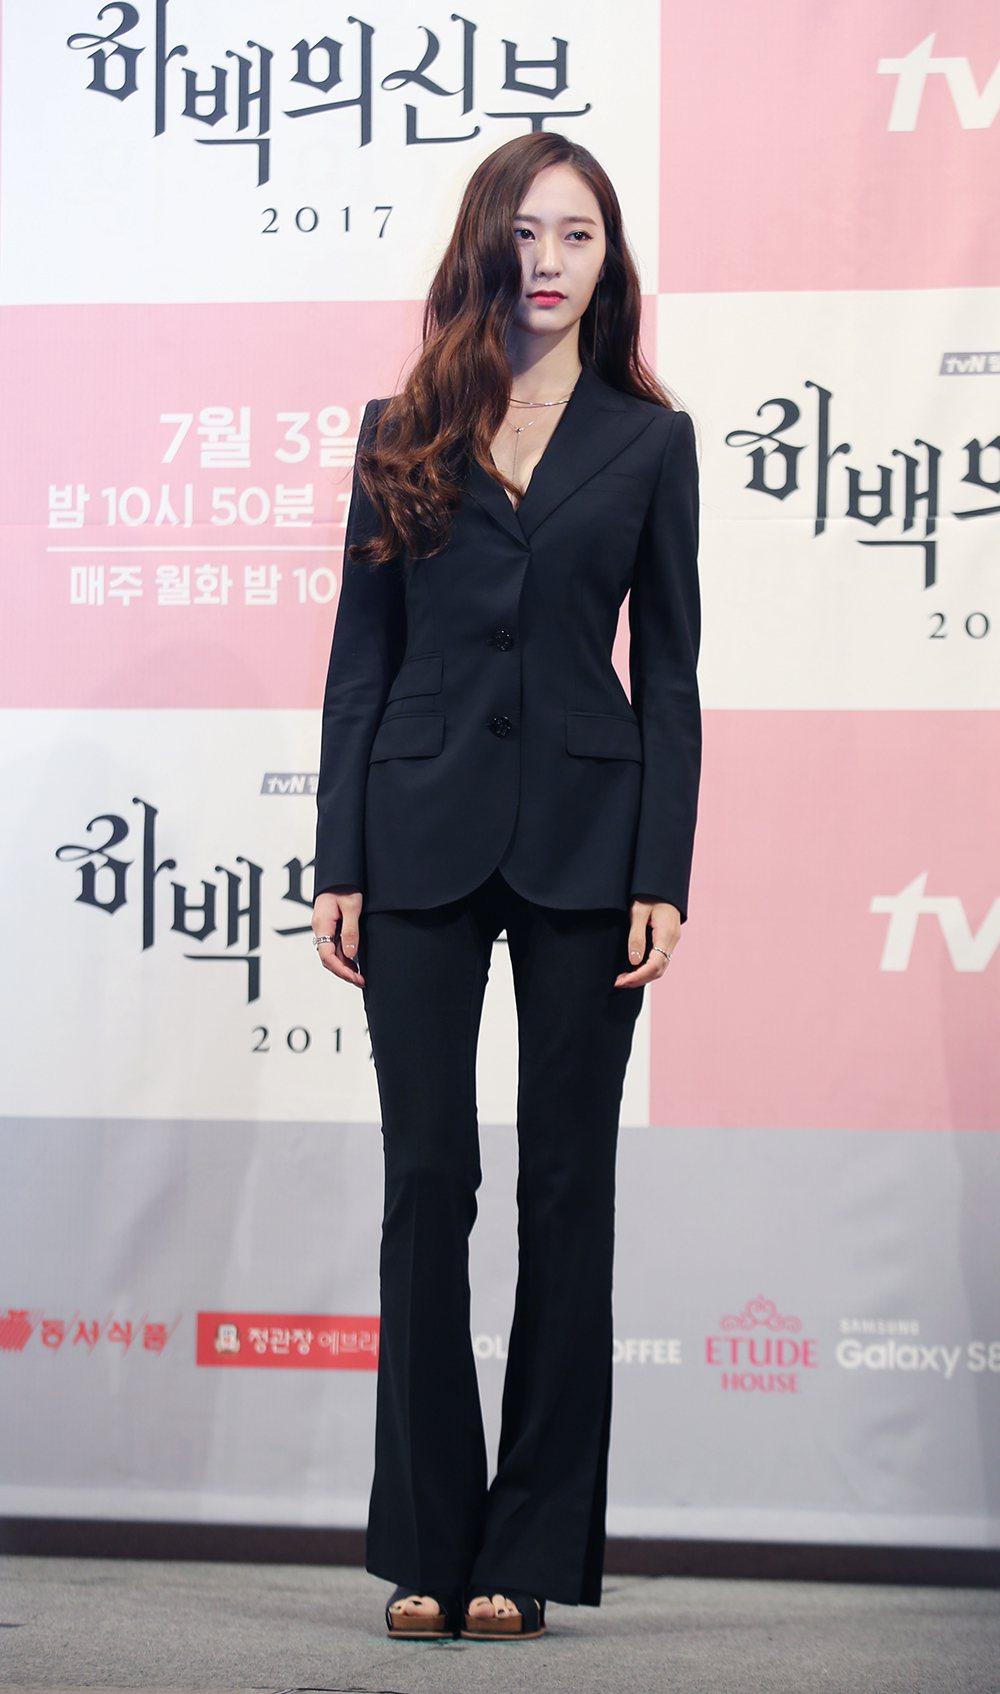 Krystal在戲裡飾演女神。圖/KKTV提供